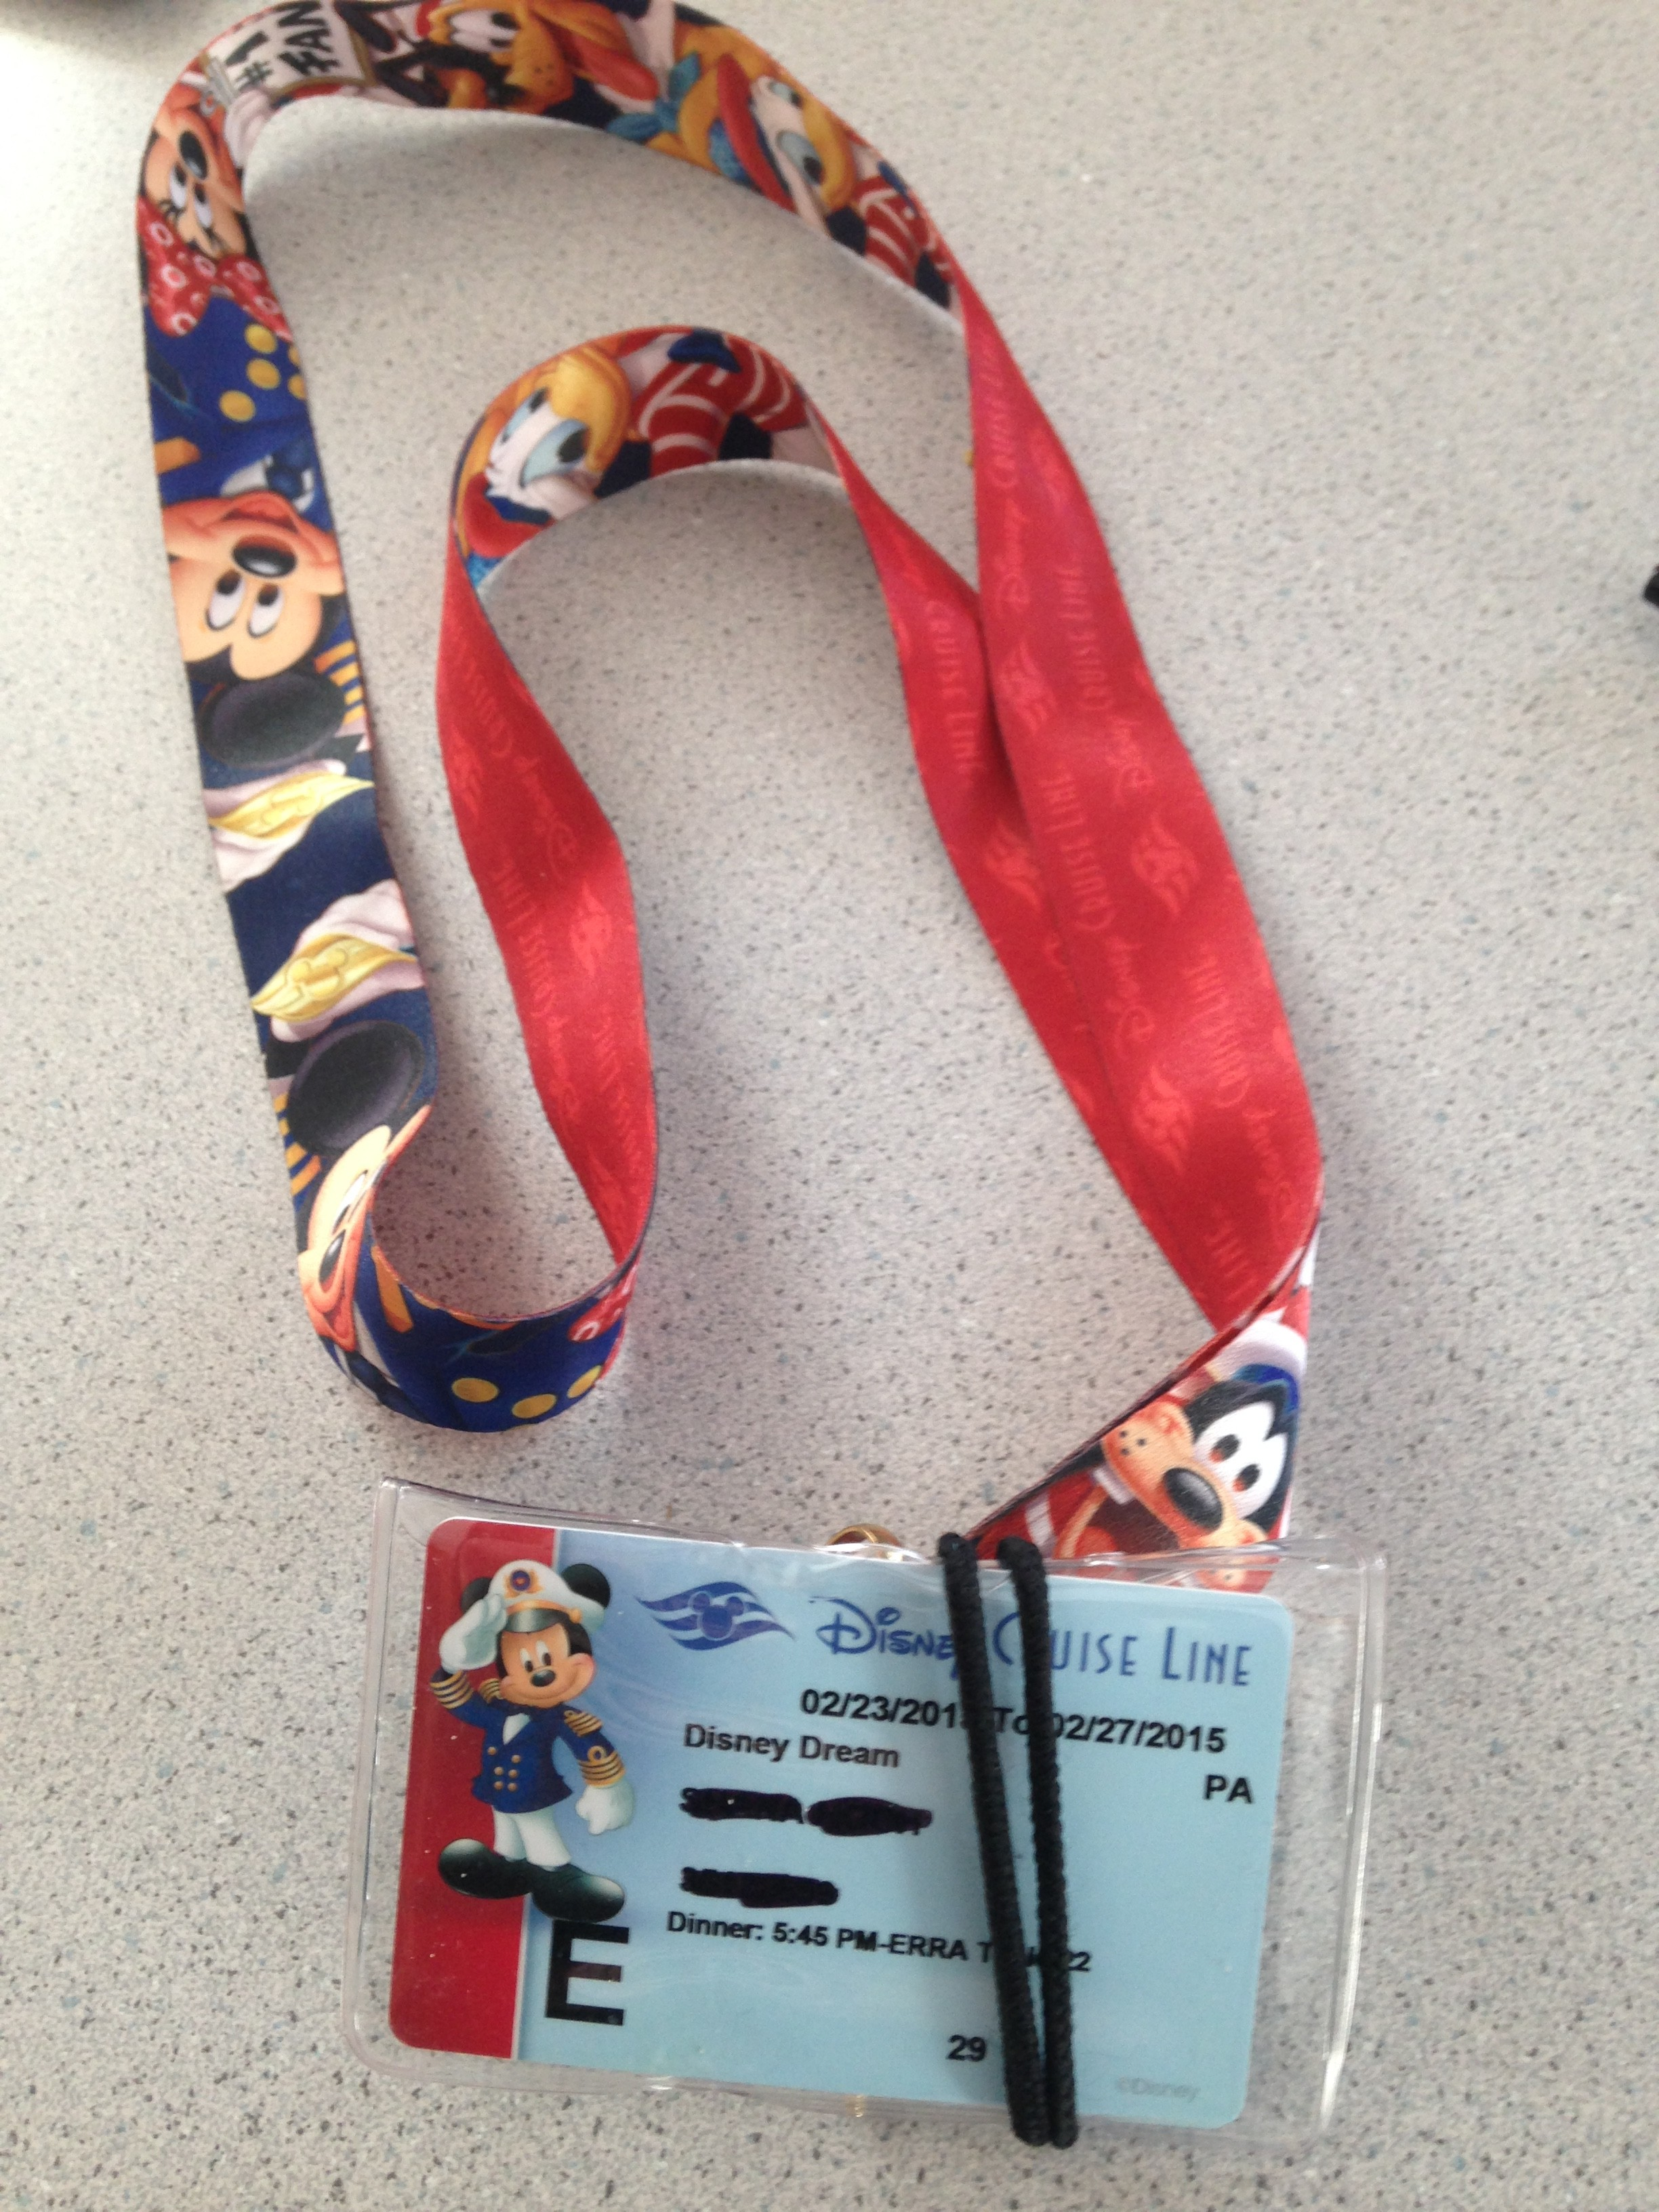 Disney Cruise - a packing checklist